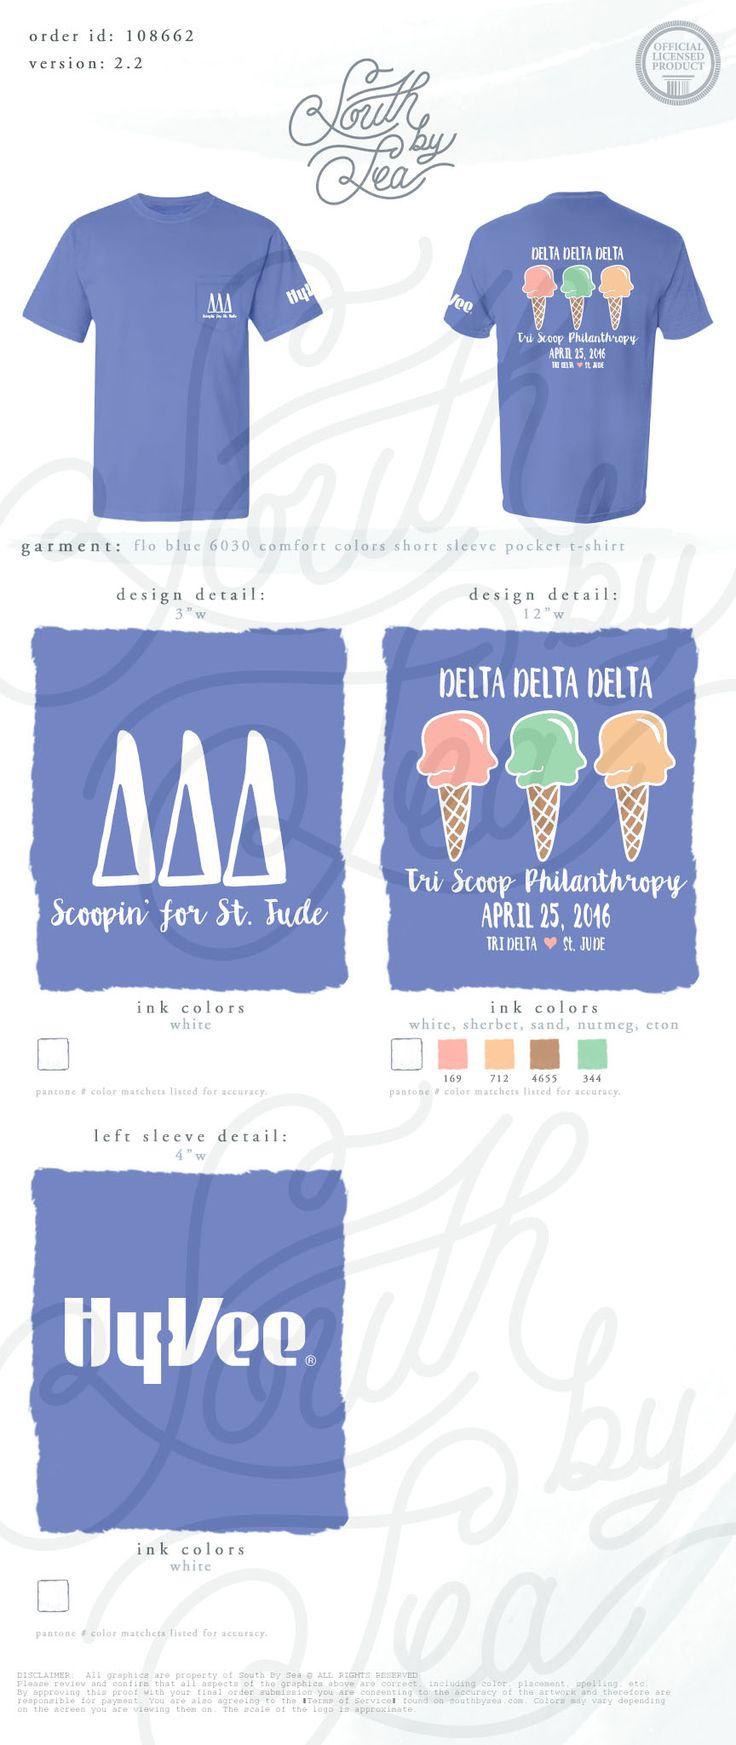 Delta Delta Delta | Tri Delta | Tri Scoop Philanthropy | Scoopin For St. Jude | South by Sea | Greek Tee Shirts | Greek Tank Tops | Custom Apparel Design | Custom Greek Apparel | Sorority Tee Shirts | Sorority Tanks | Sorority Shirt Designs